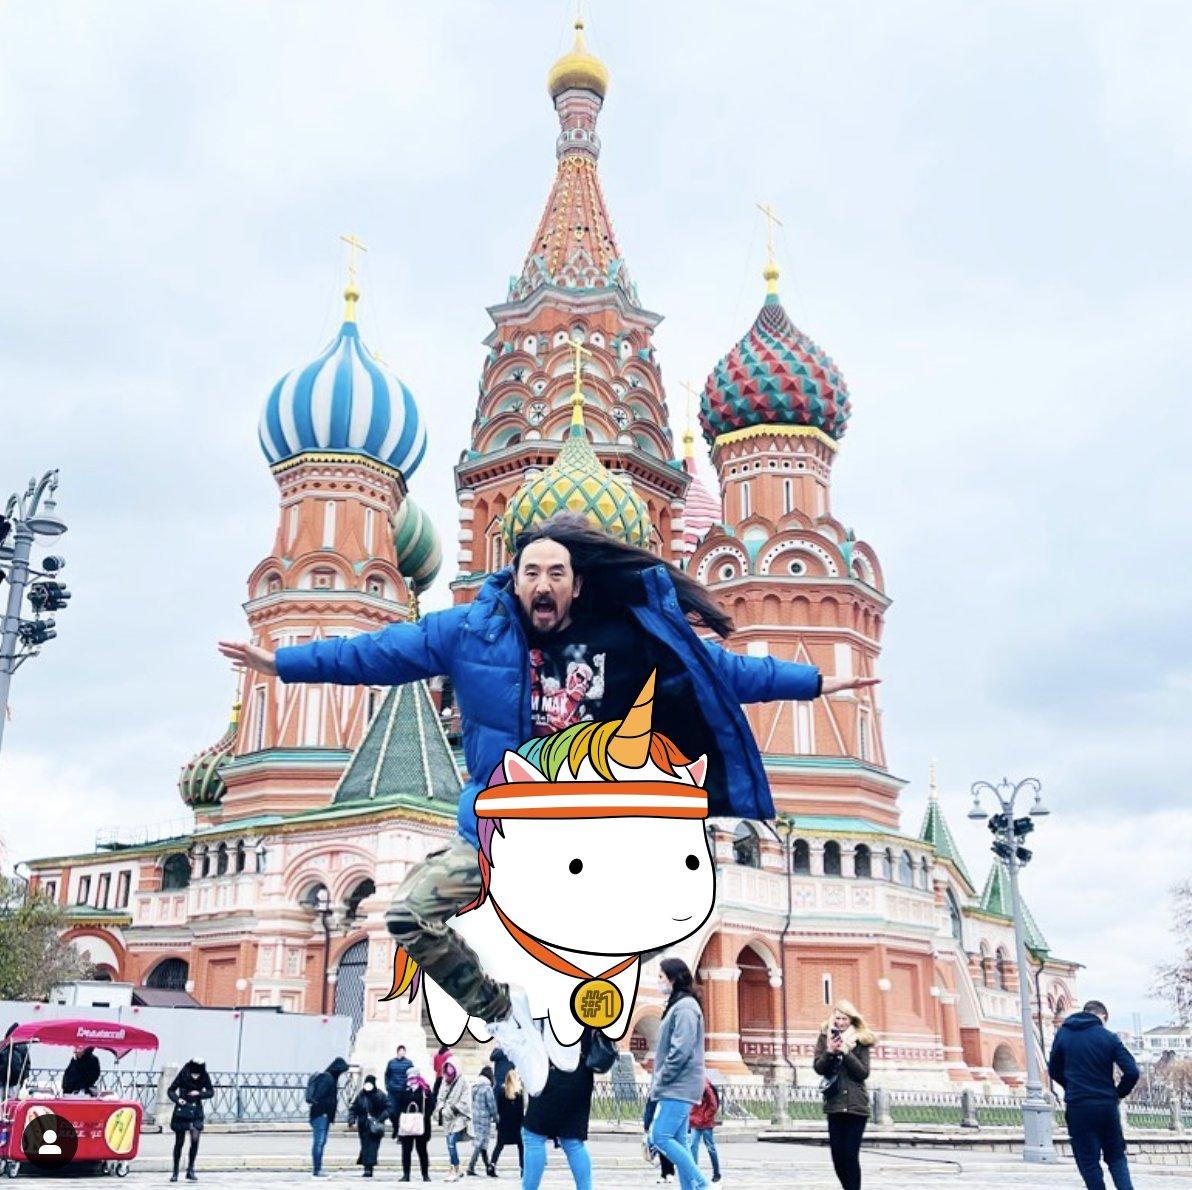 .@steveaoki in Moscow!!!!!!   #aokijump #chubbijump #1052